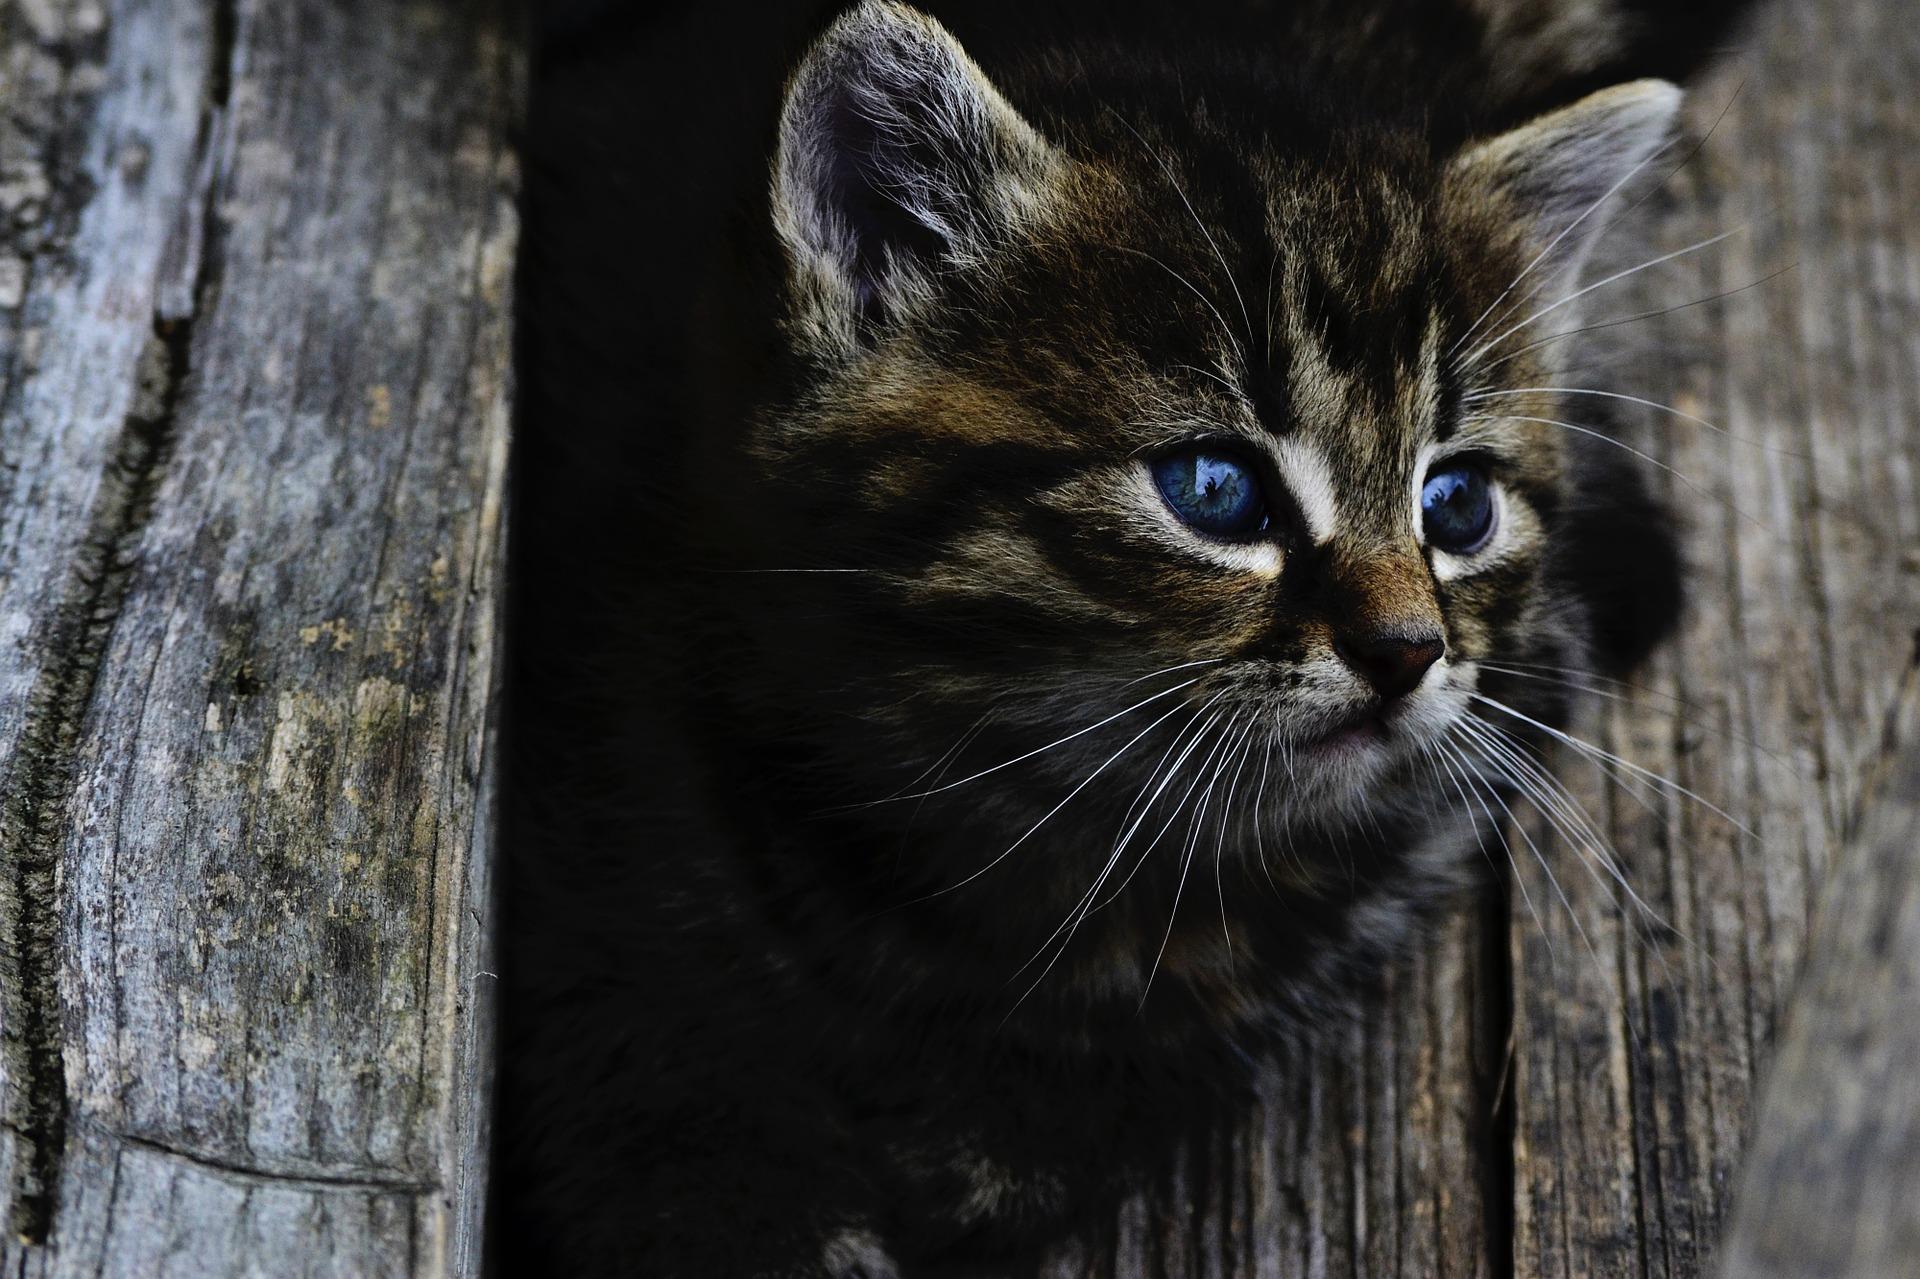 cat-914110_1920.jpg